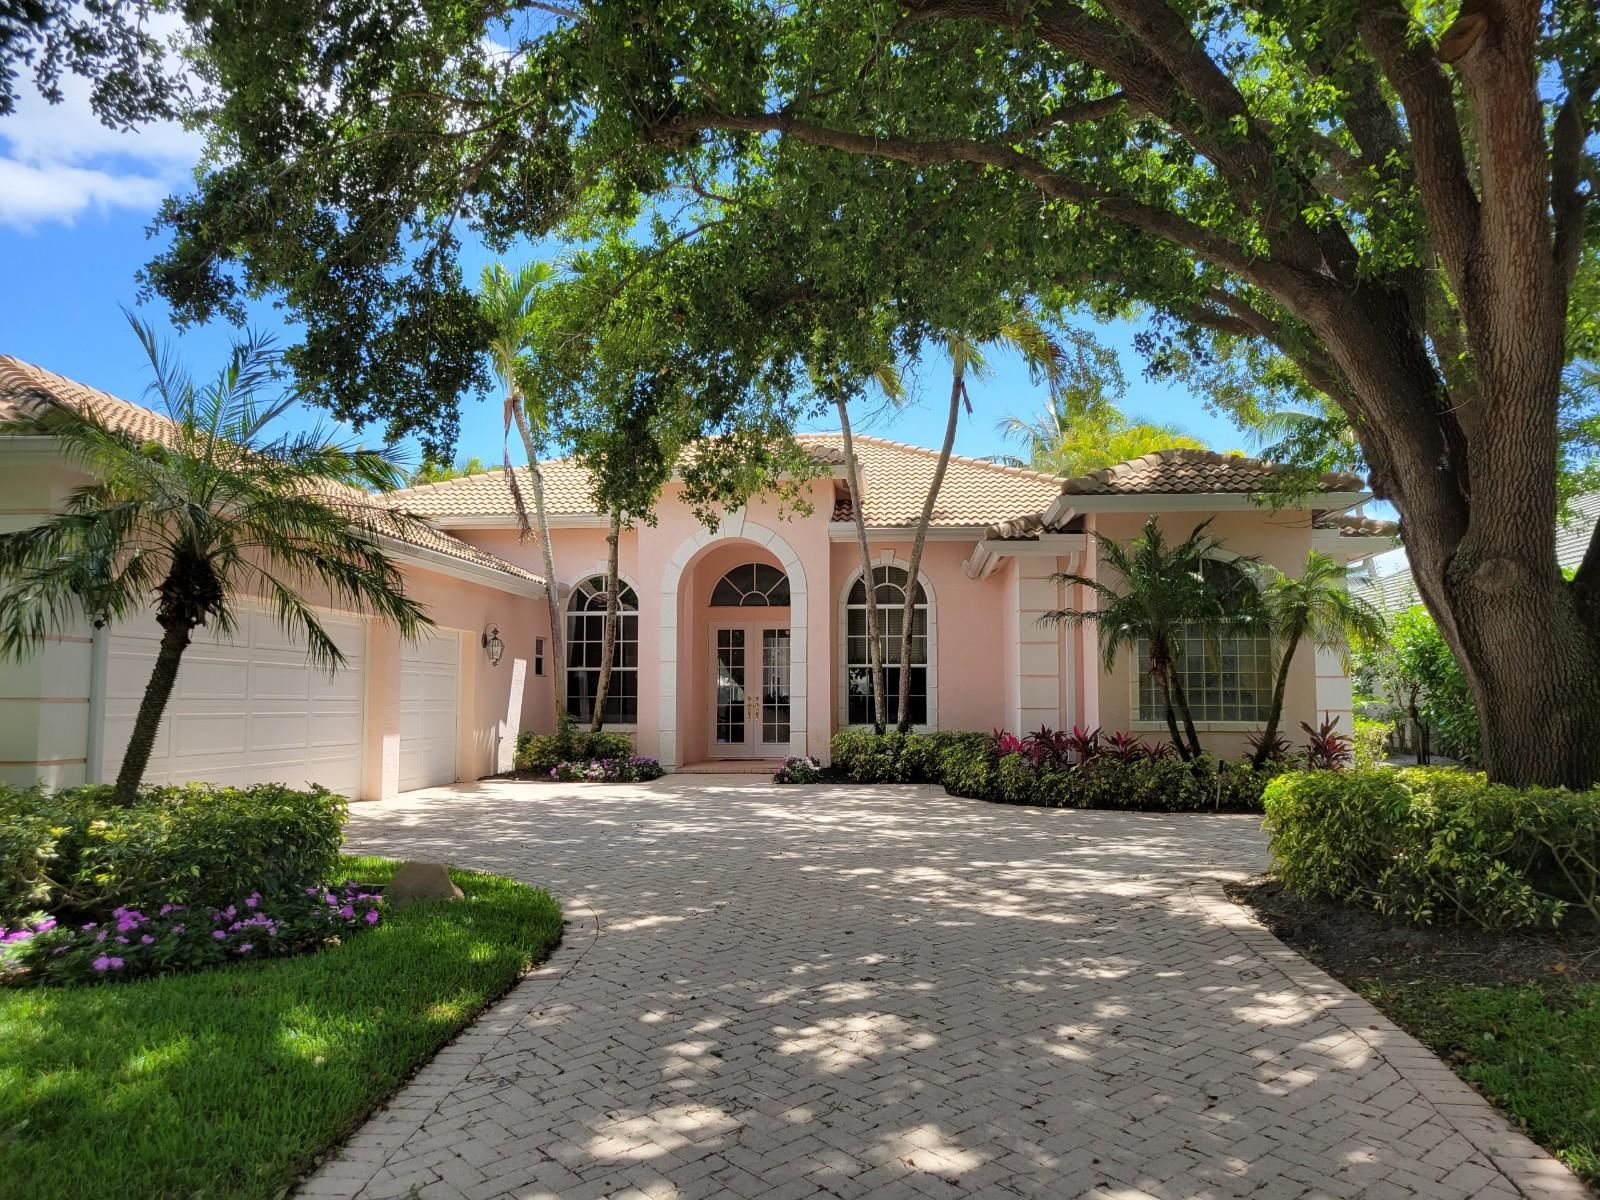 Photo of 4 Bermuda Lake Drive, Palm Beach Gardens, FL 33418 (MLS # RX-10705236)